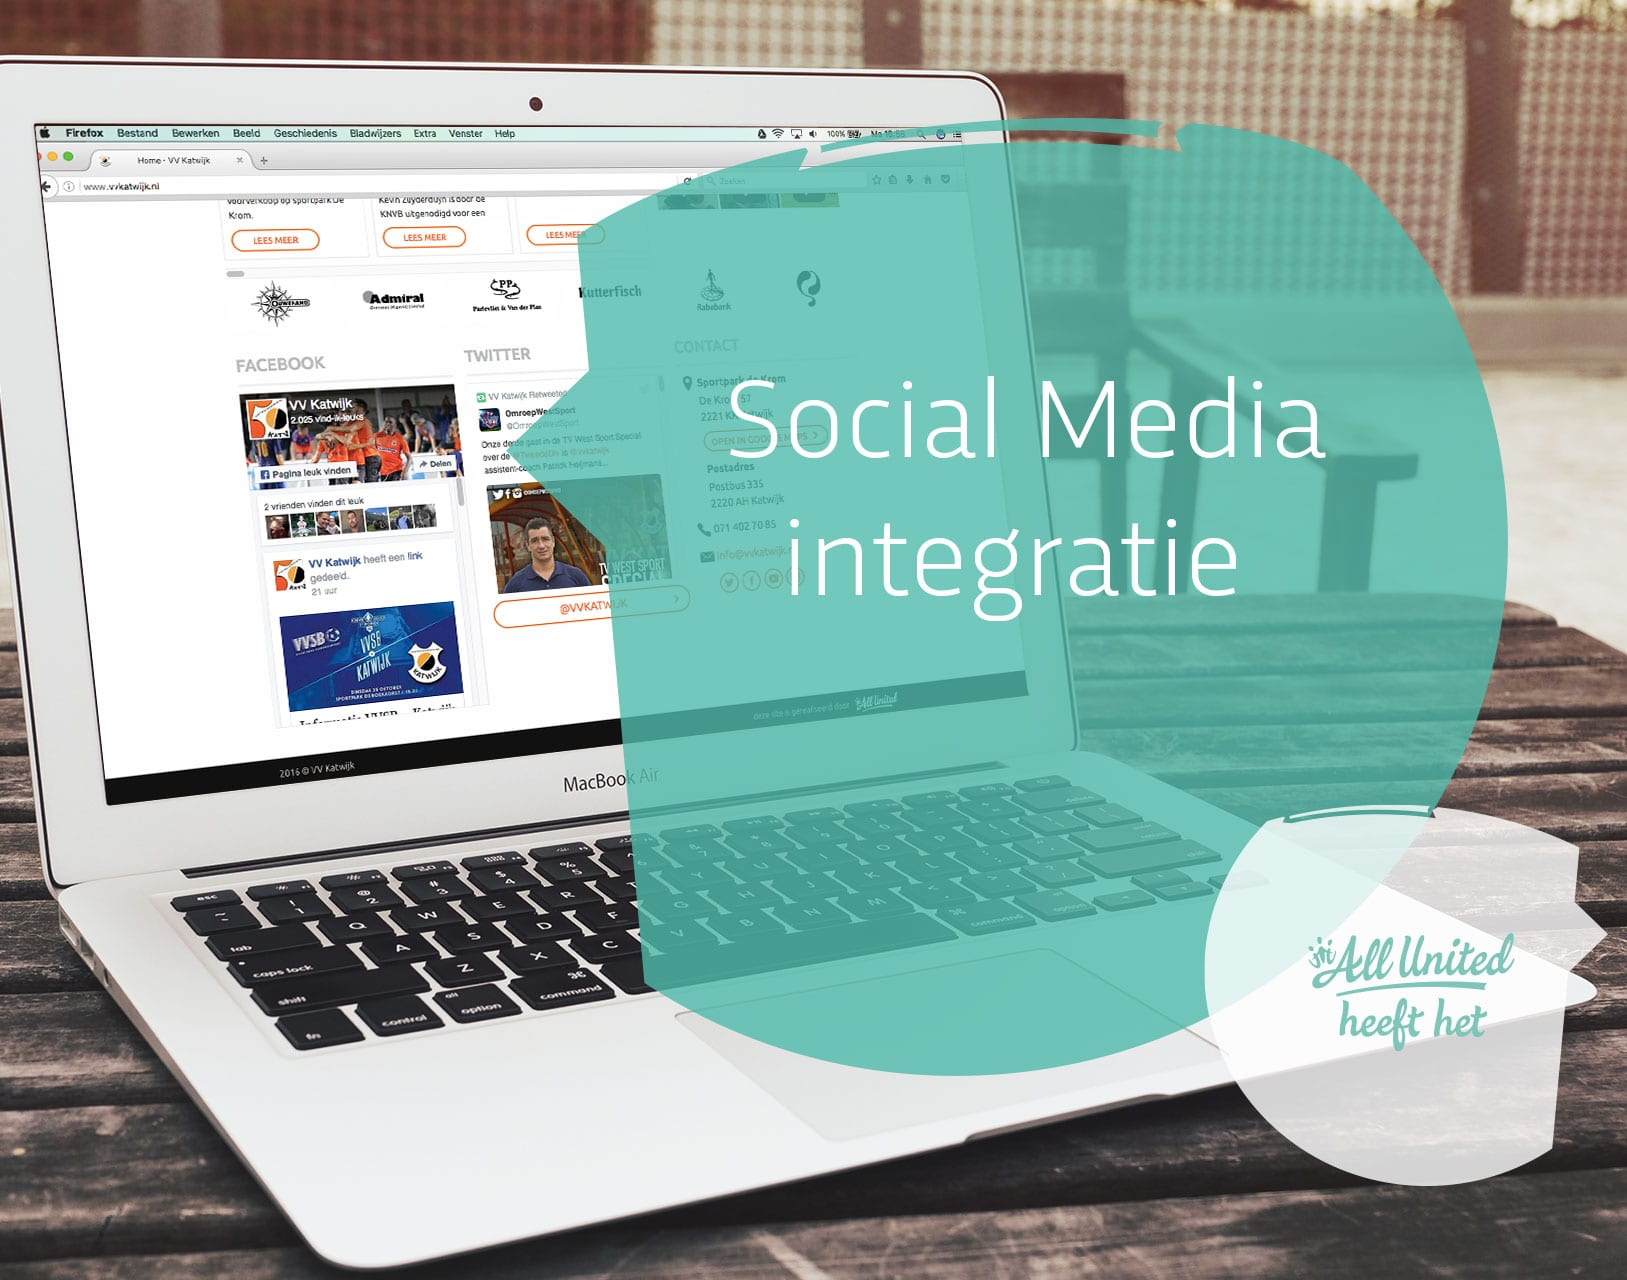 Socialmedia-integratie